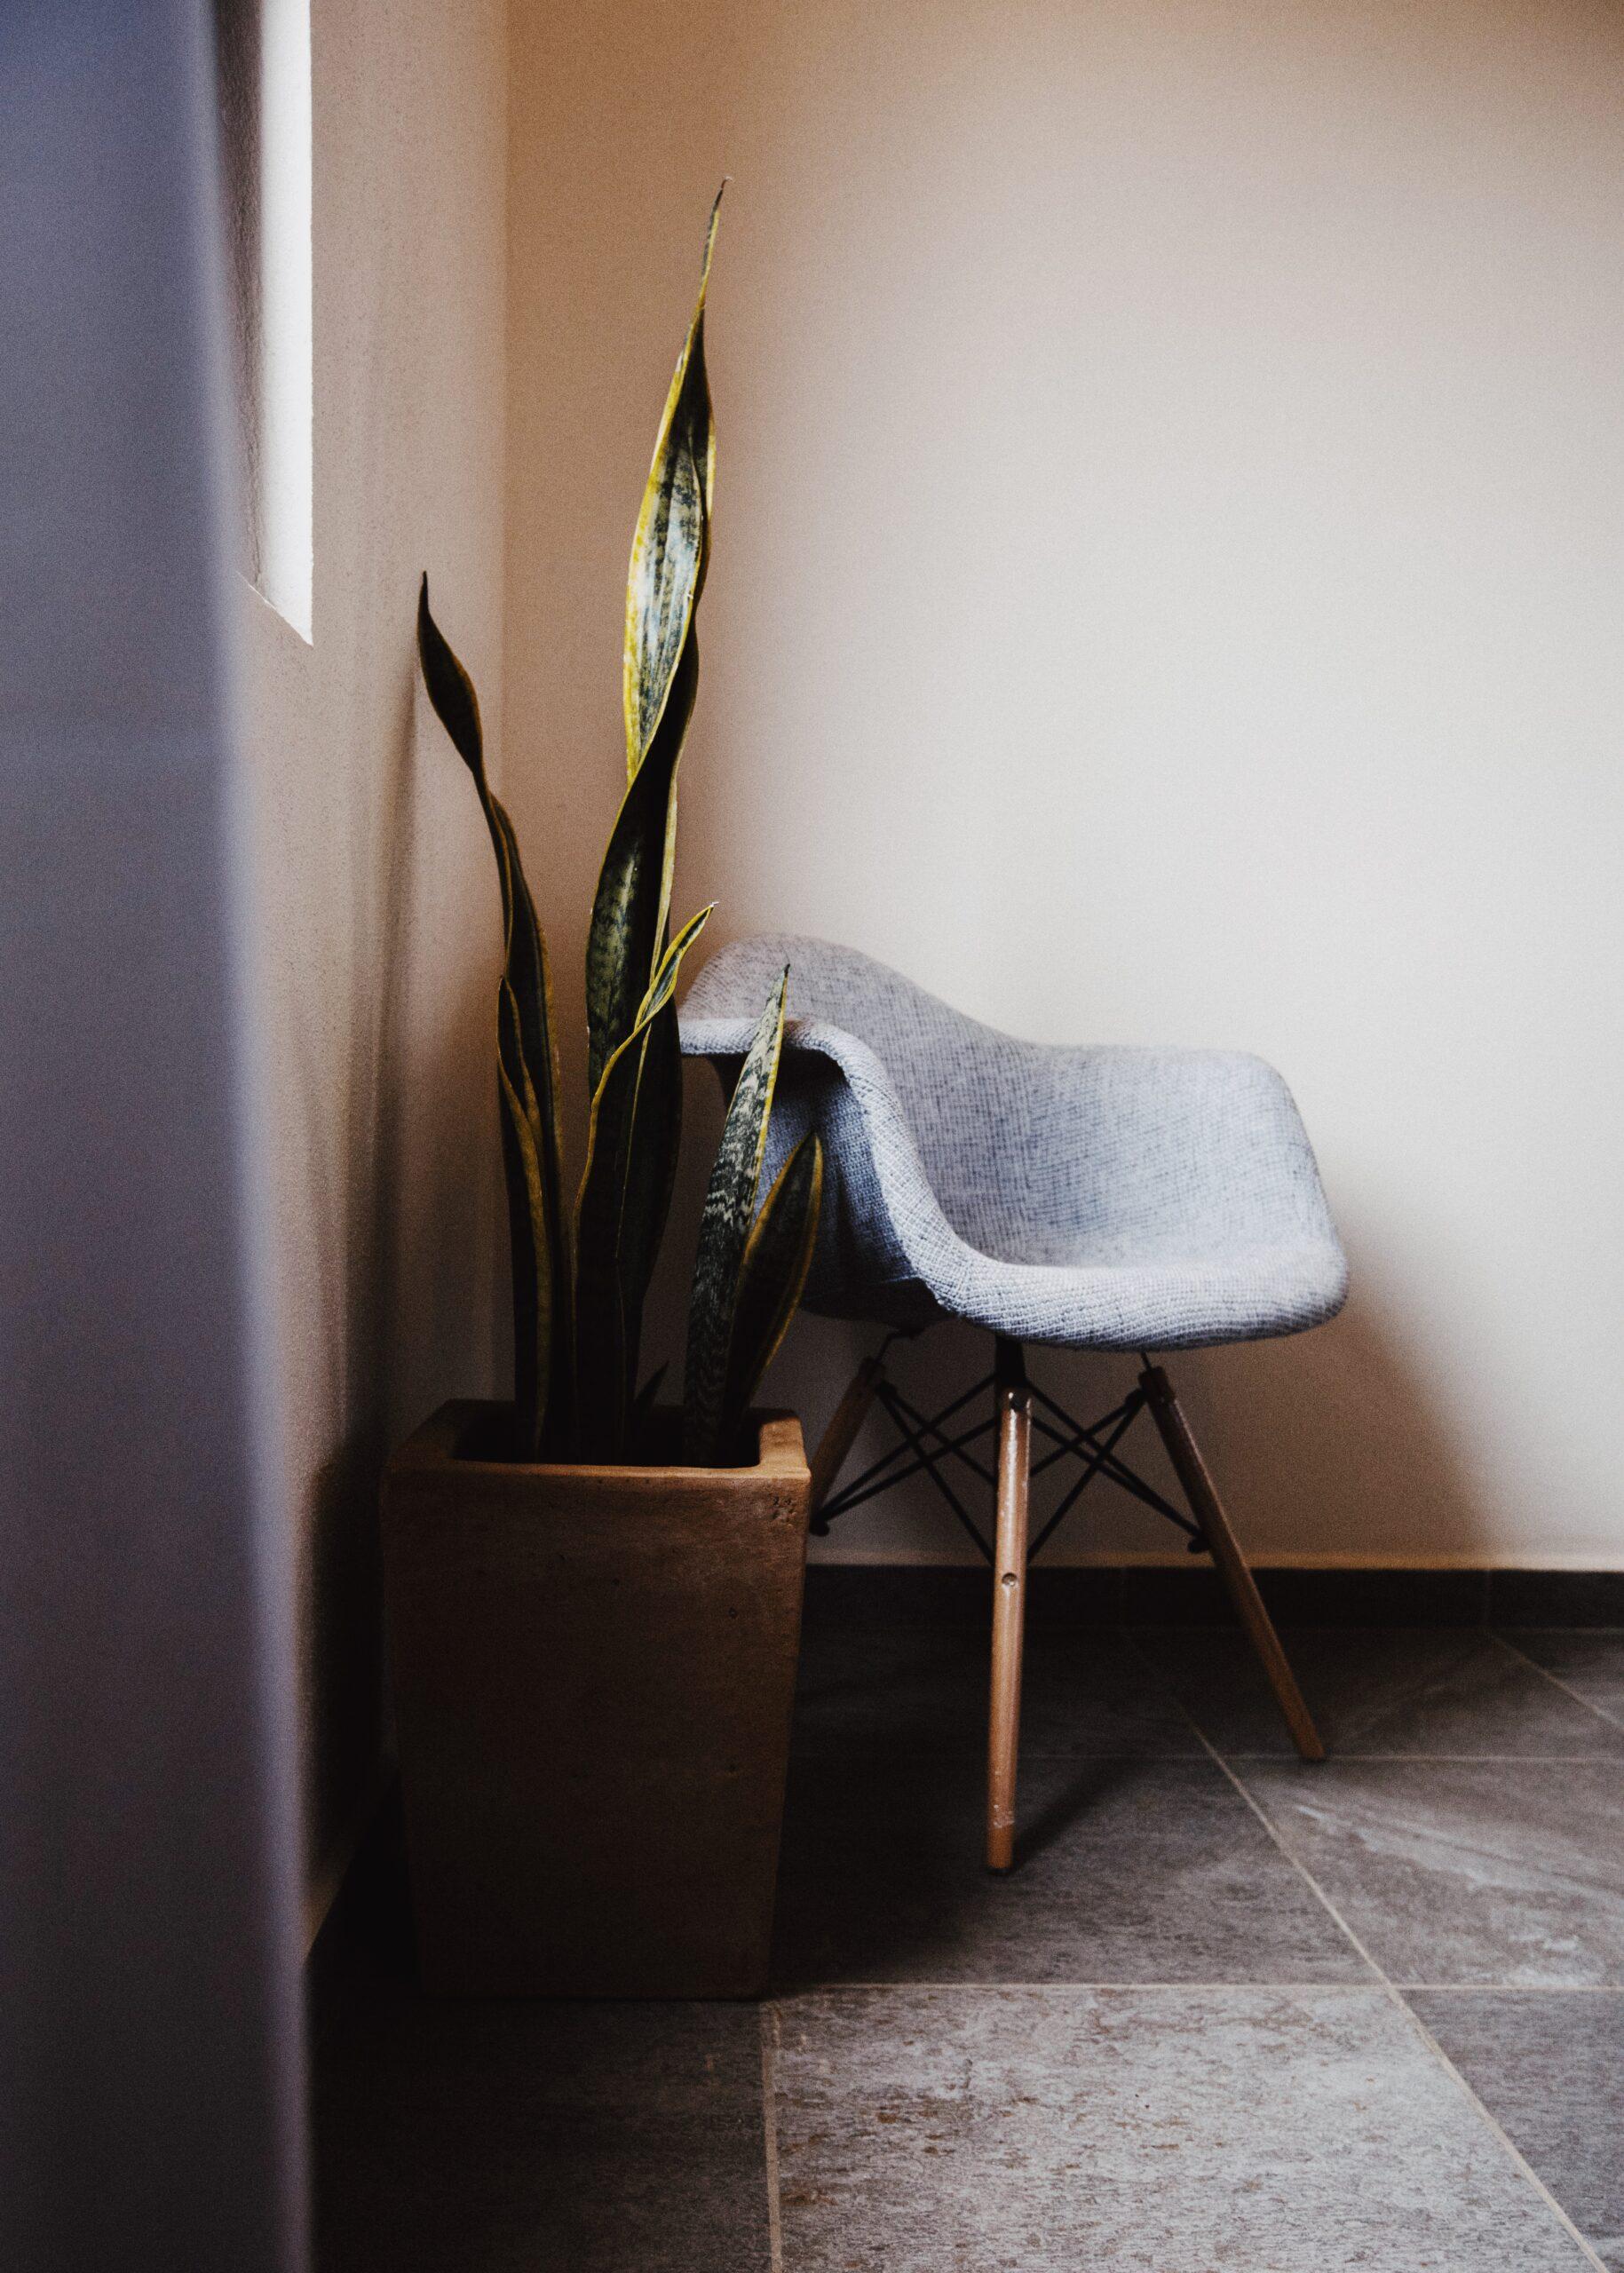 Florence Sayulita - Interior Details